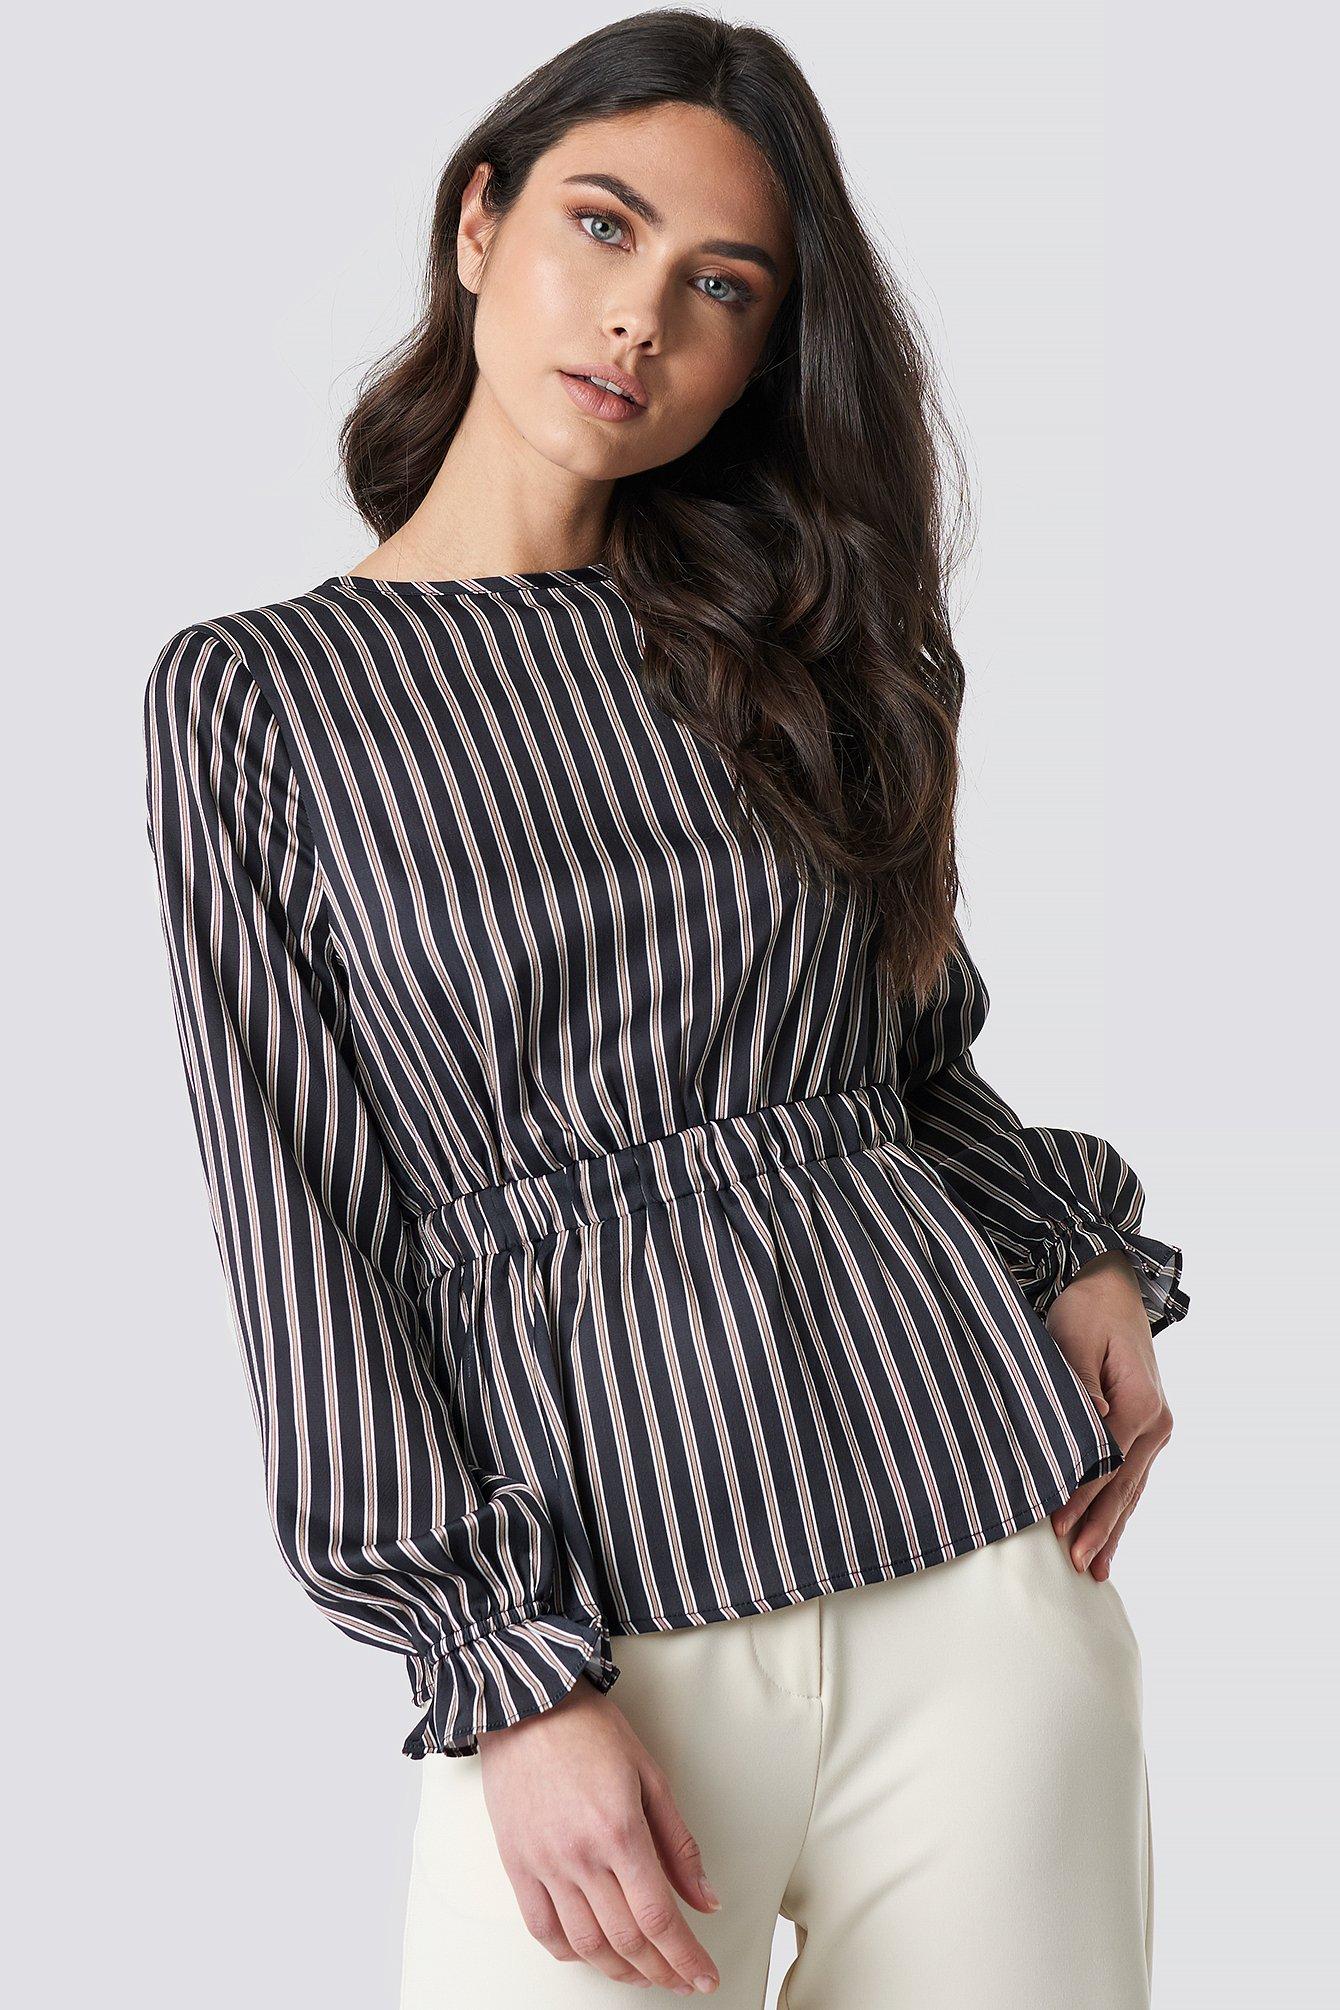 504054f9c76ab ...  https://cdn.shoplightspeed.com/shops/604799/files/11886949/yellow-striped-top-w-elastic-waist-and-tie-sleeves.jpg.  If you like that look, ...